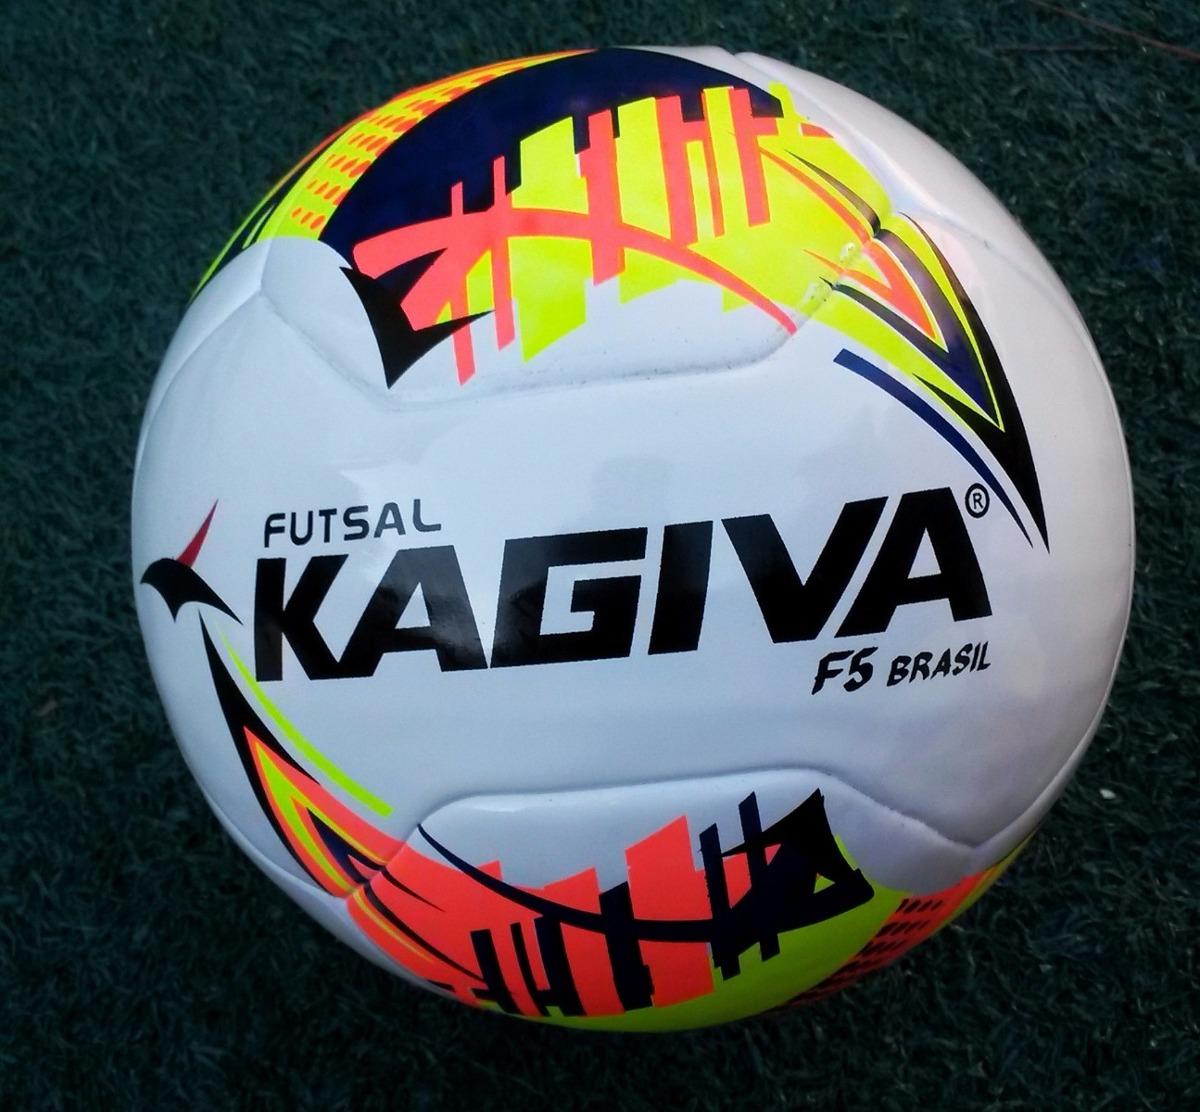 4a286fbbffe4d bola futsal kagiva f5 brasil pro da liga futsal oficial. Carregando zoom.